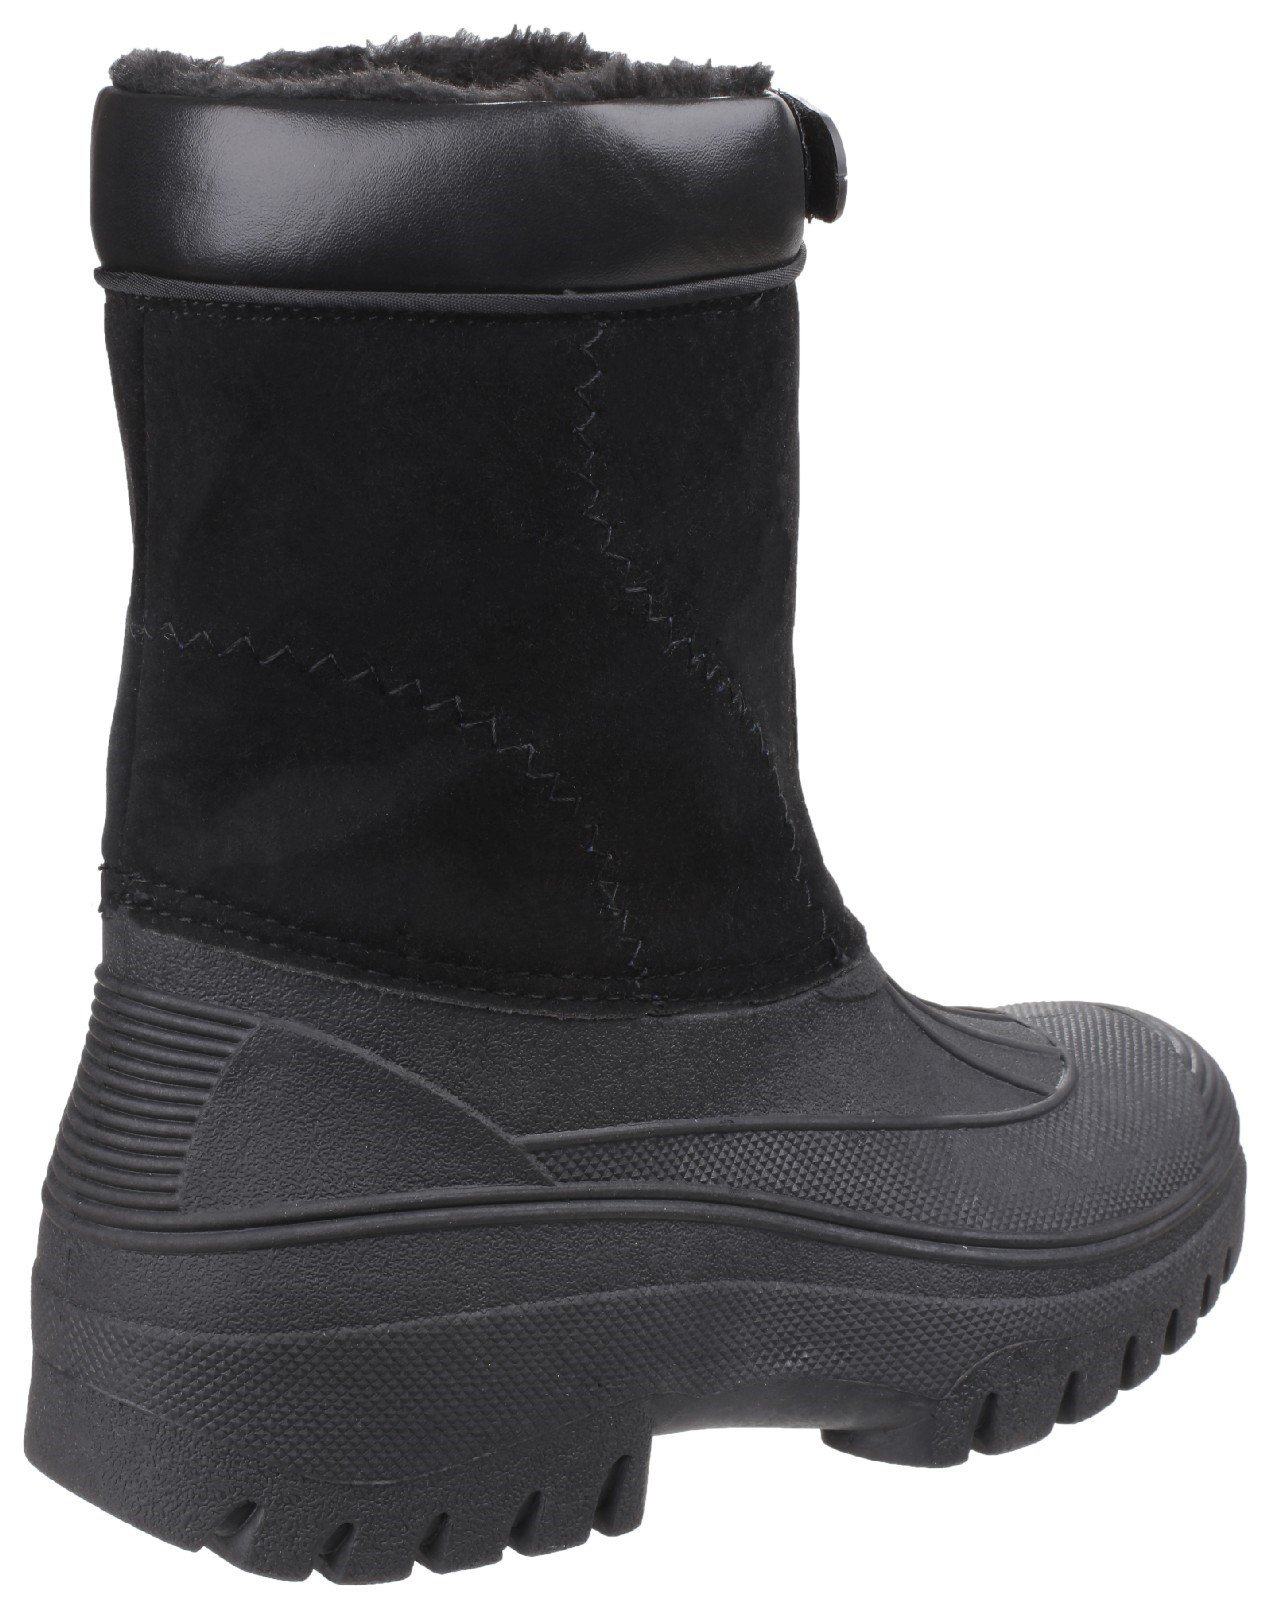 Cotswold Women's Venture Waterproof Winter Boot Various Colours 16569 - Black 2